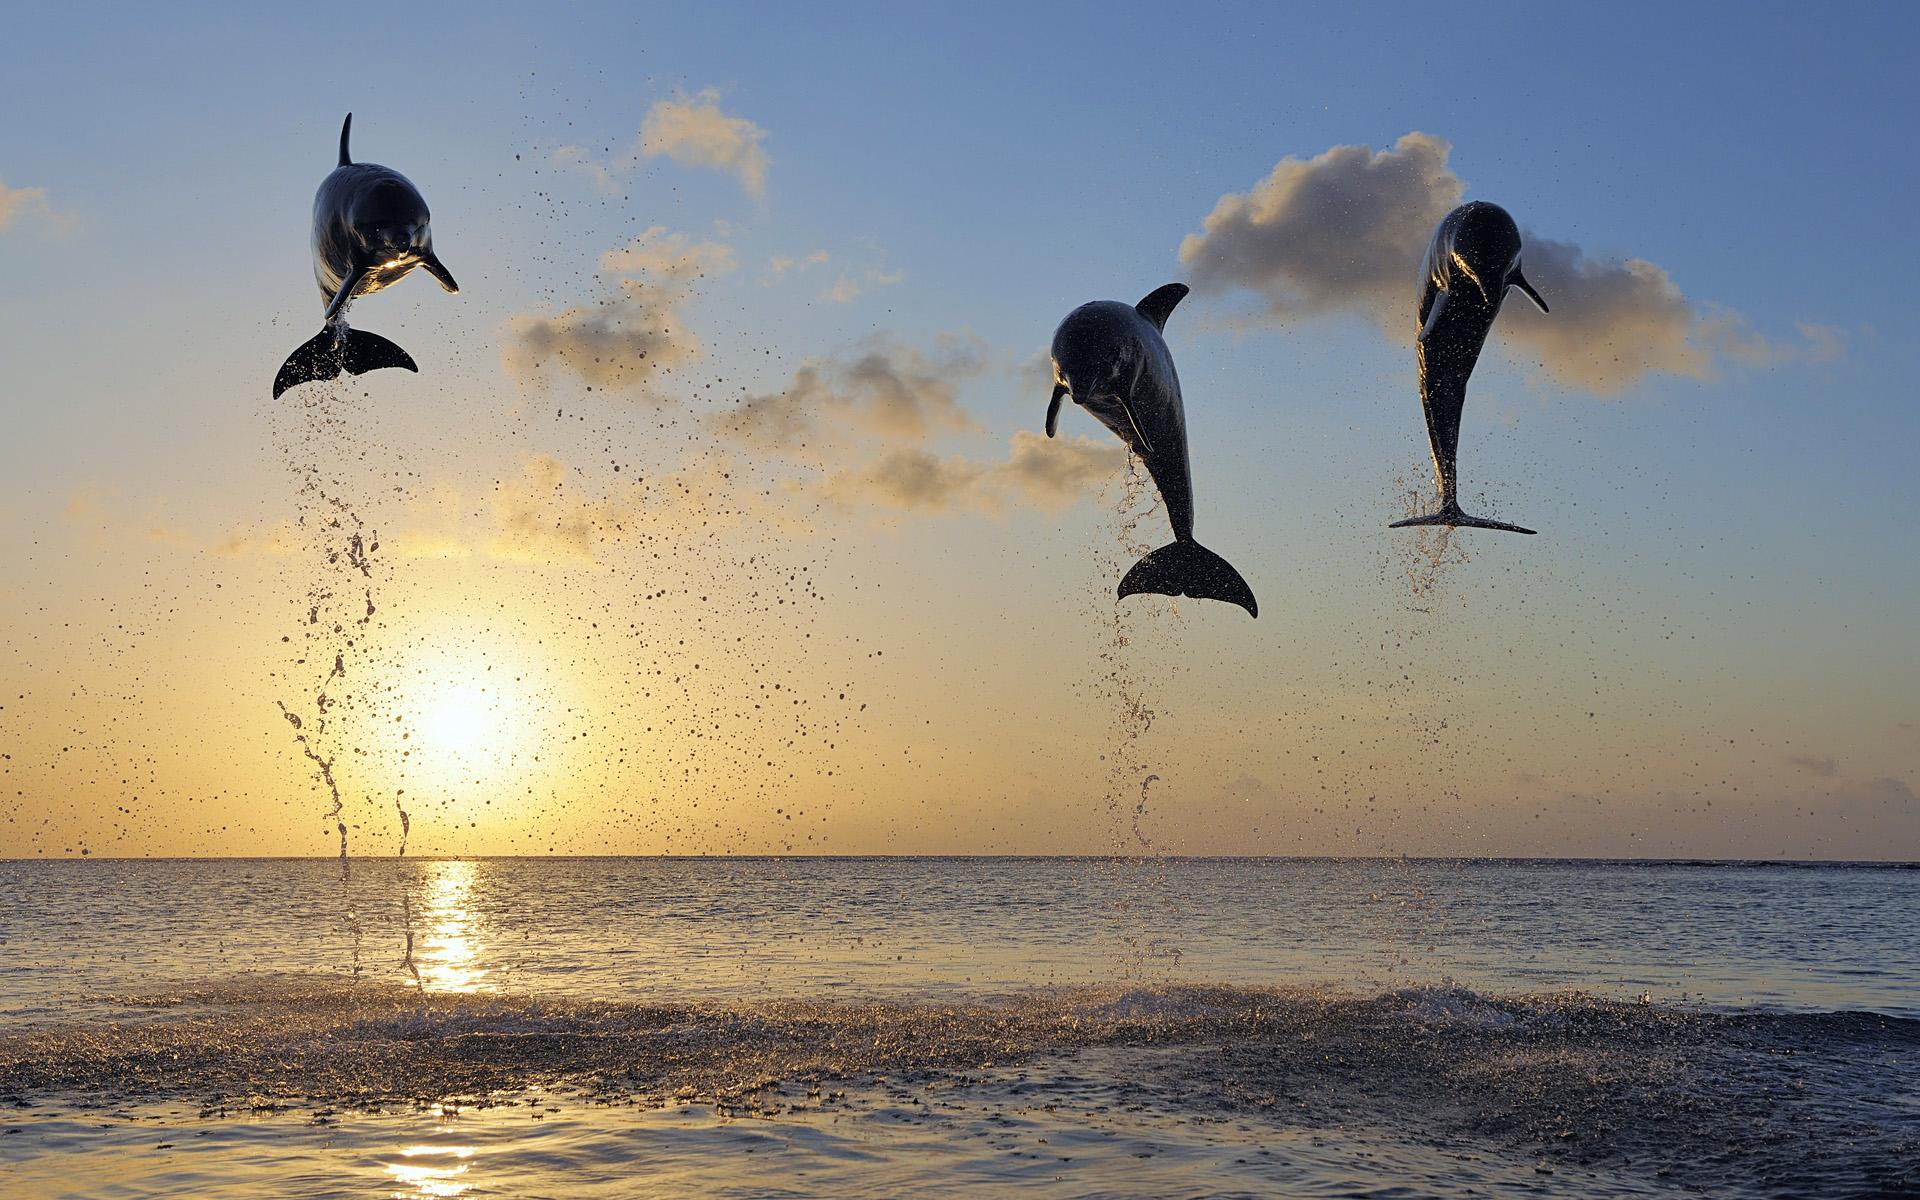 Common Bottlenose Dolphins jumping in sea at sunset, Roatán, Bay Islands, Honduras